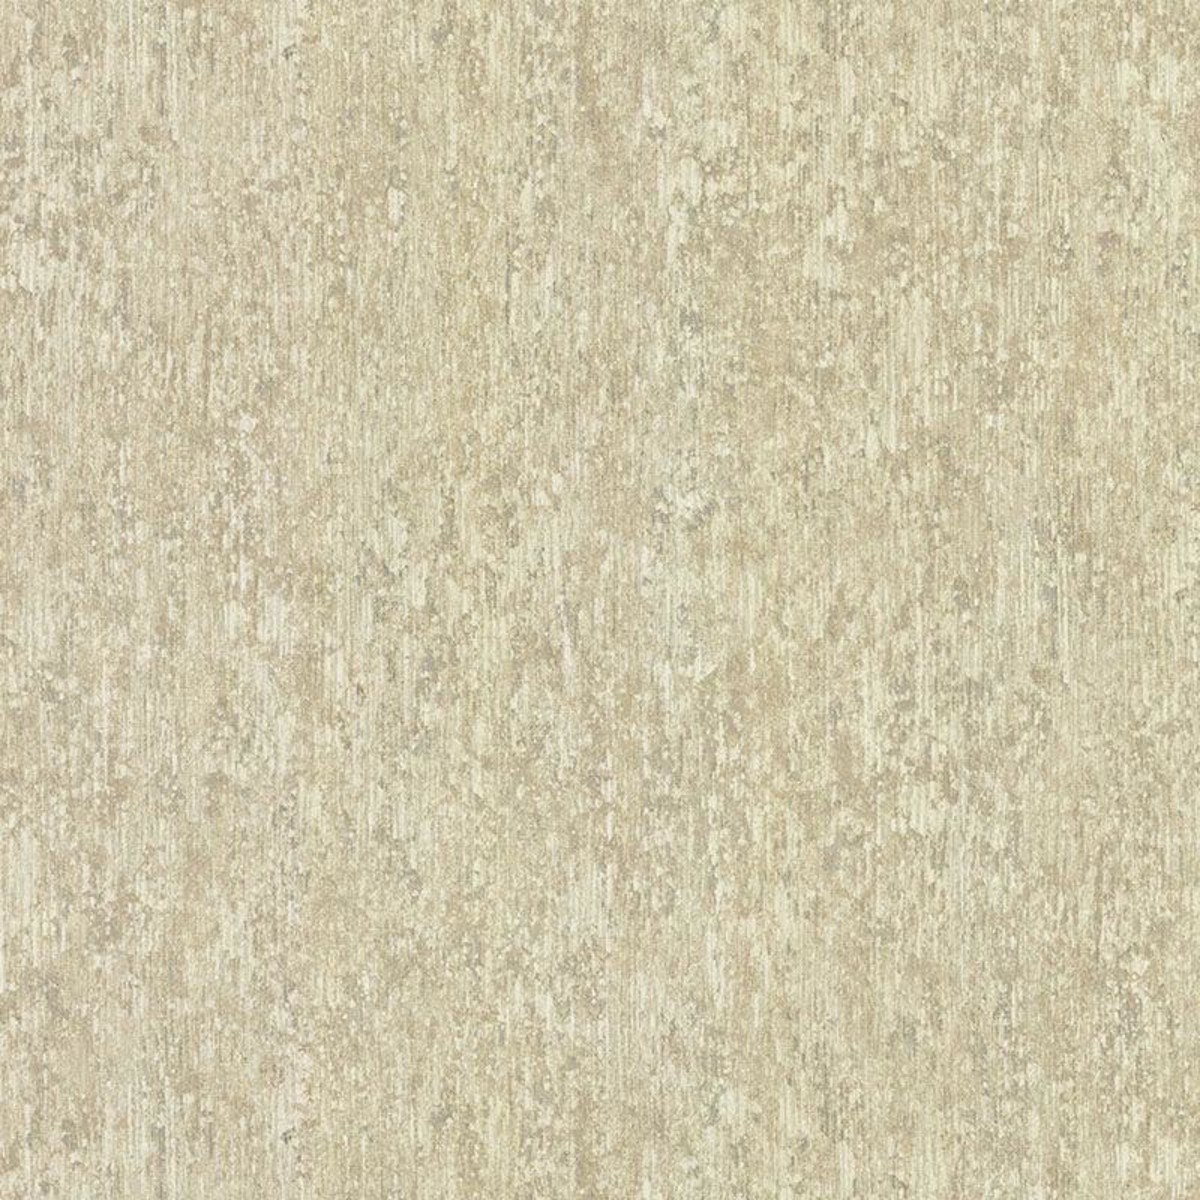 Обои флизелиновые Decori-Decori Altera бежевые 1.06 м 82329